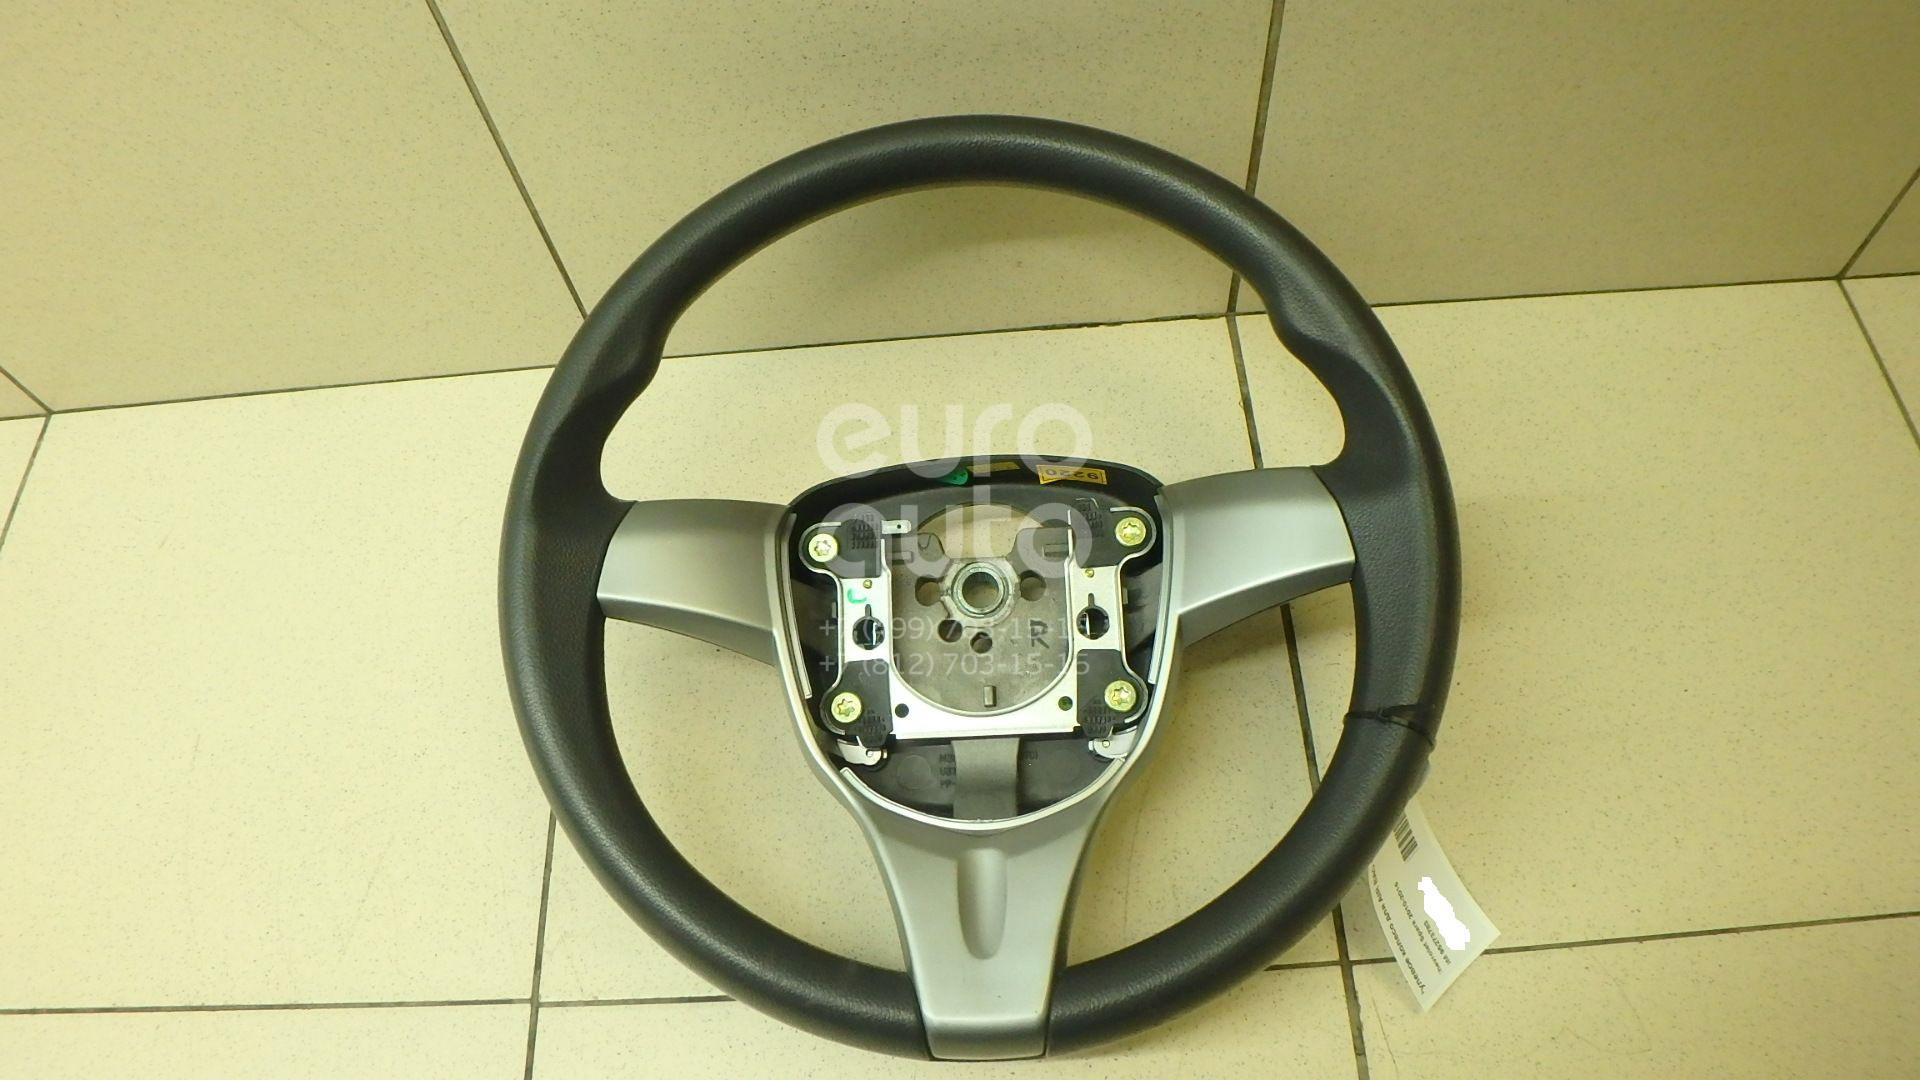 Купить Рулевое колесо для AIR BAG (без AIR BAG) Chevrolet Spark 2010-2015; (95273783)